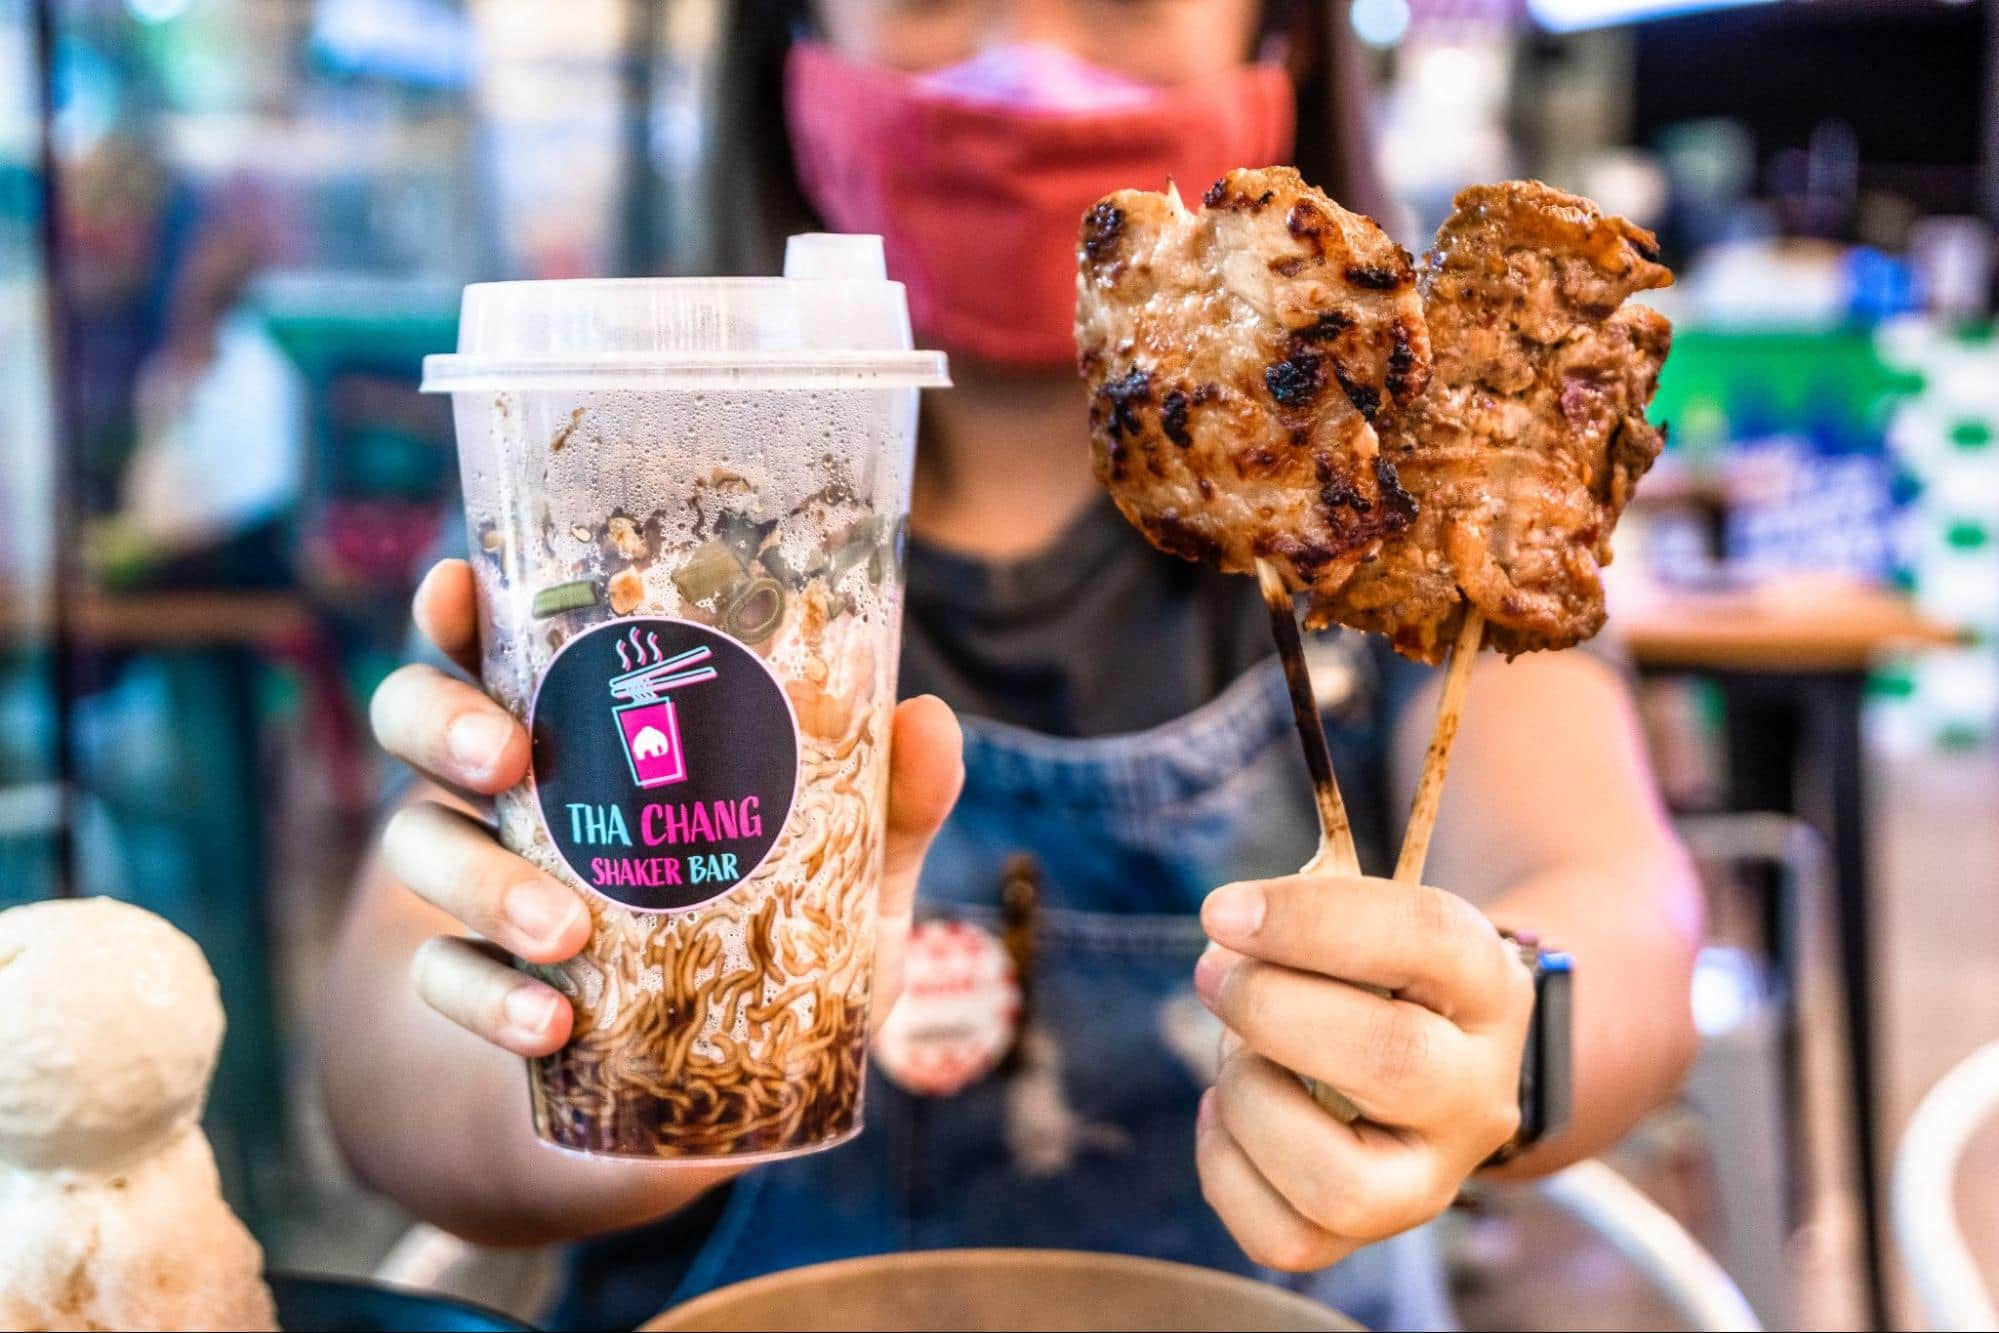 New restaurants in September - eatbox thachang